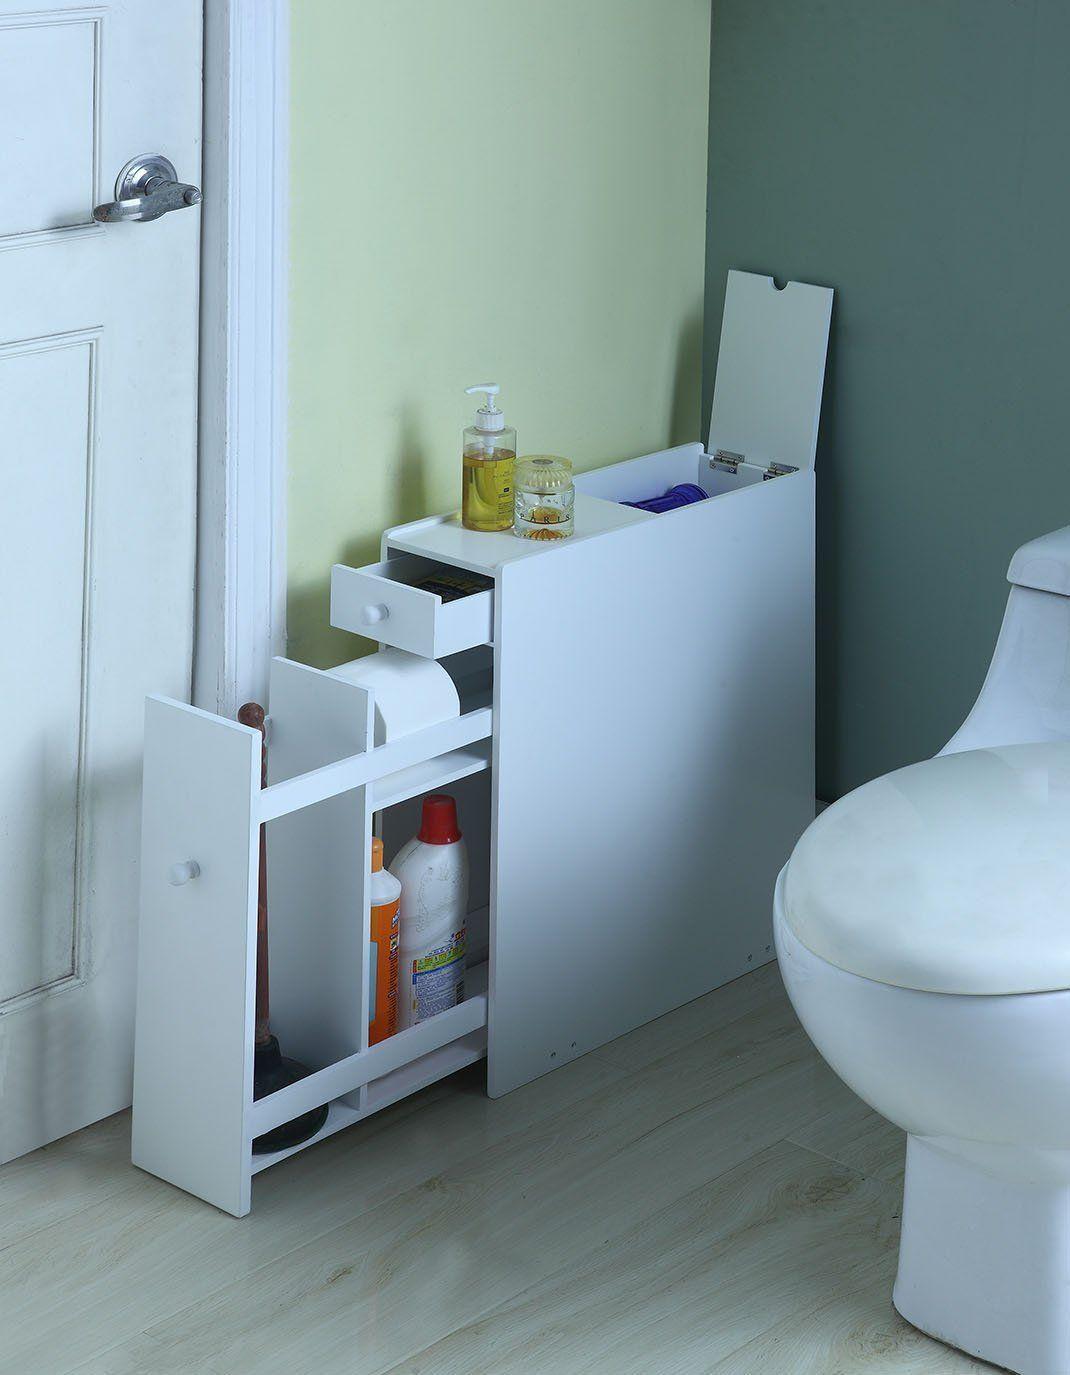 Amazon.com: Proman Products Bathroom Floor Cabinet: Kitchen & Dining ...